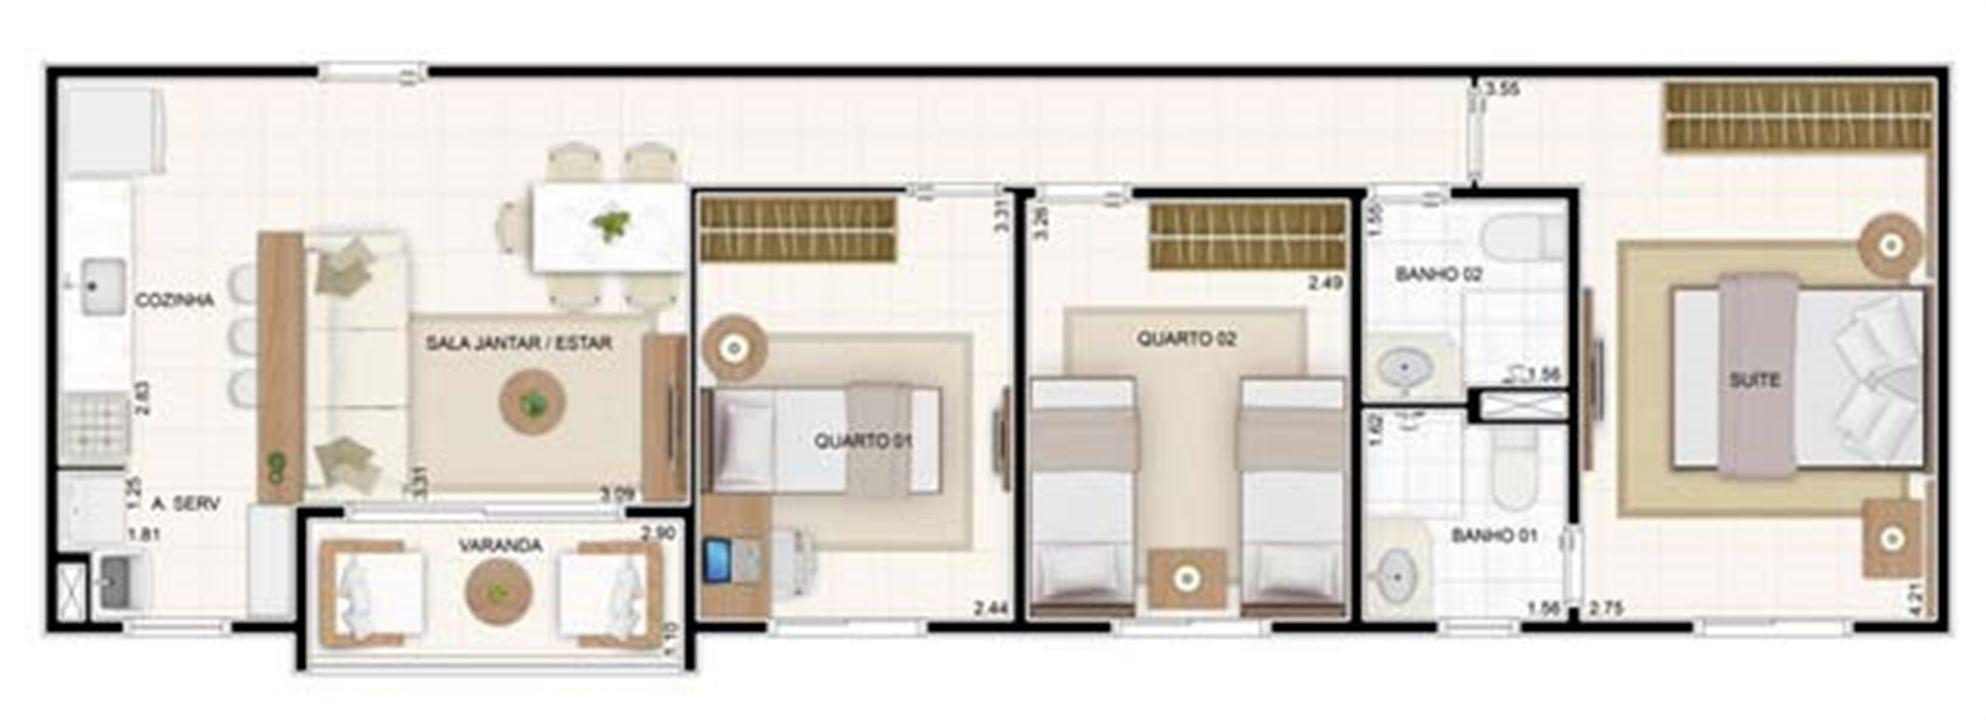 3 dorms 67,35m²   Vita 2 Residencial Clube – Apartamentono  Pitimbu - Natal - Rio Grande do Norte